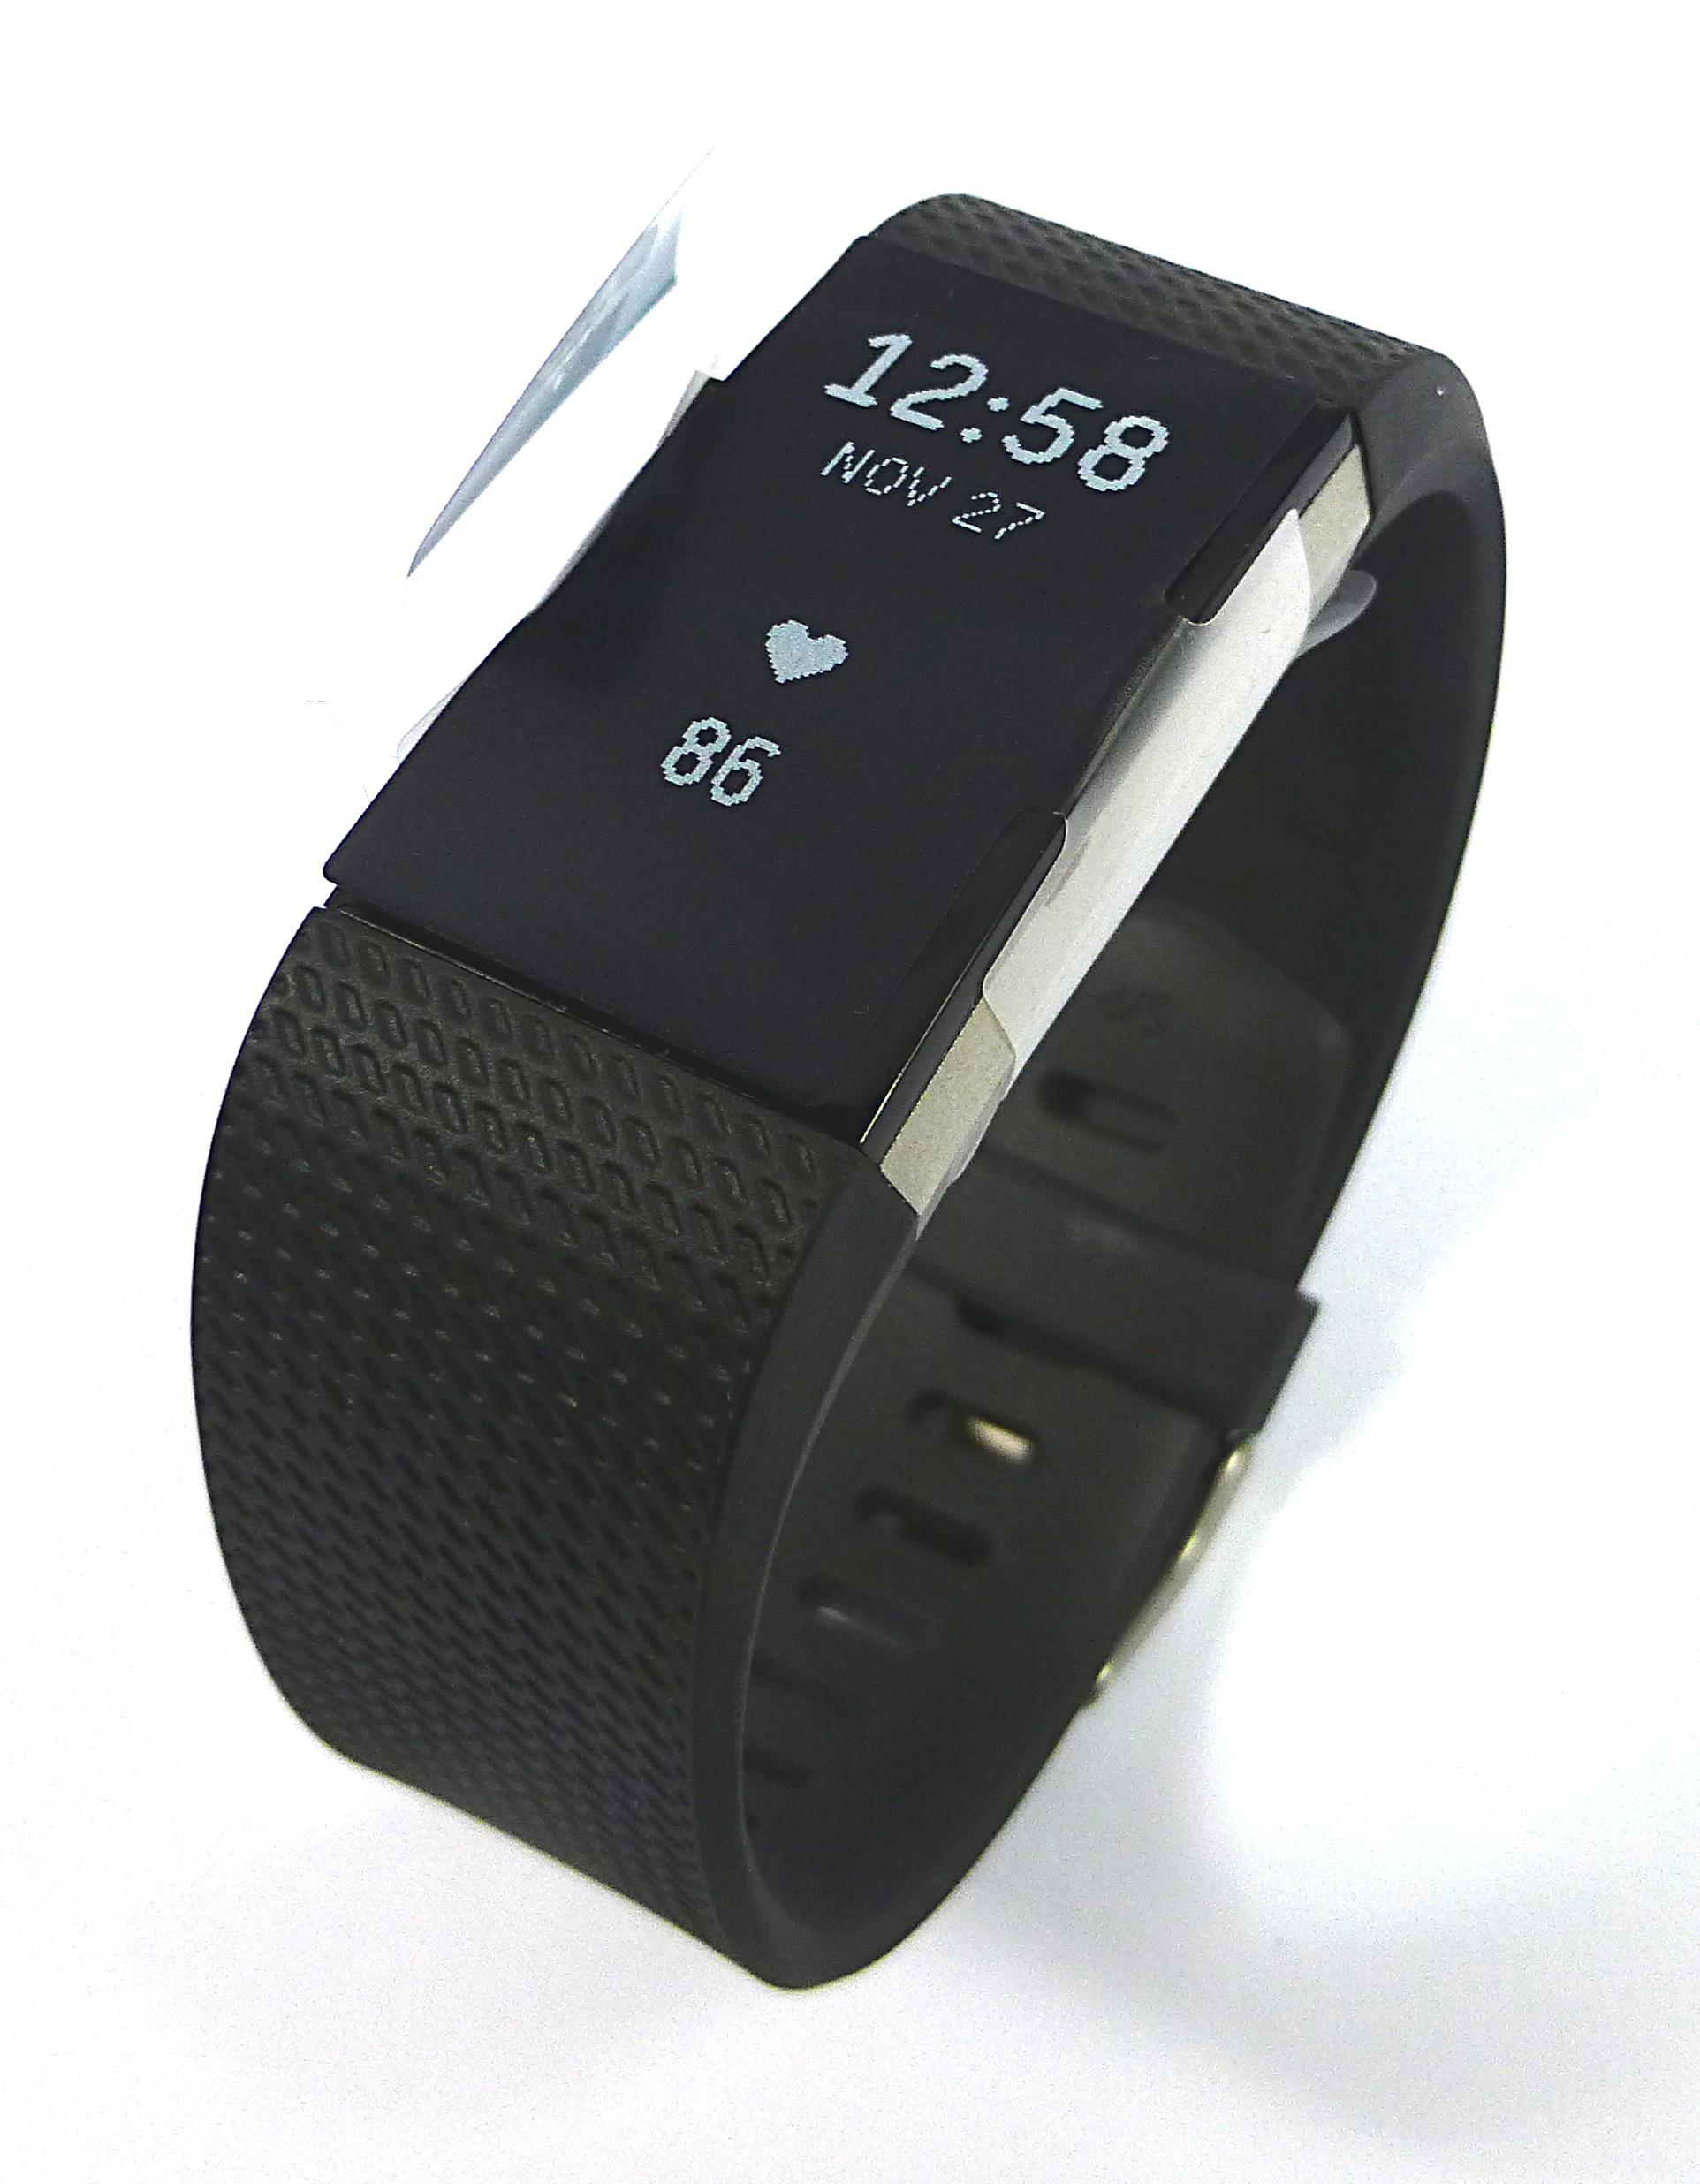 fitbit charge 2 fitness activity tracker fb407sbkl eu. Black Bedroom Furniture Sets. Home Design Ideas